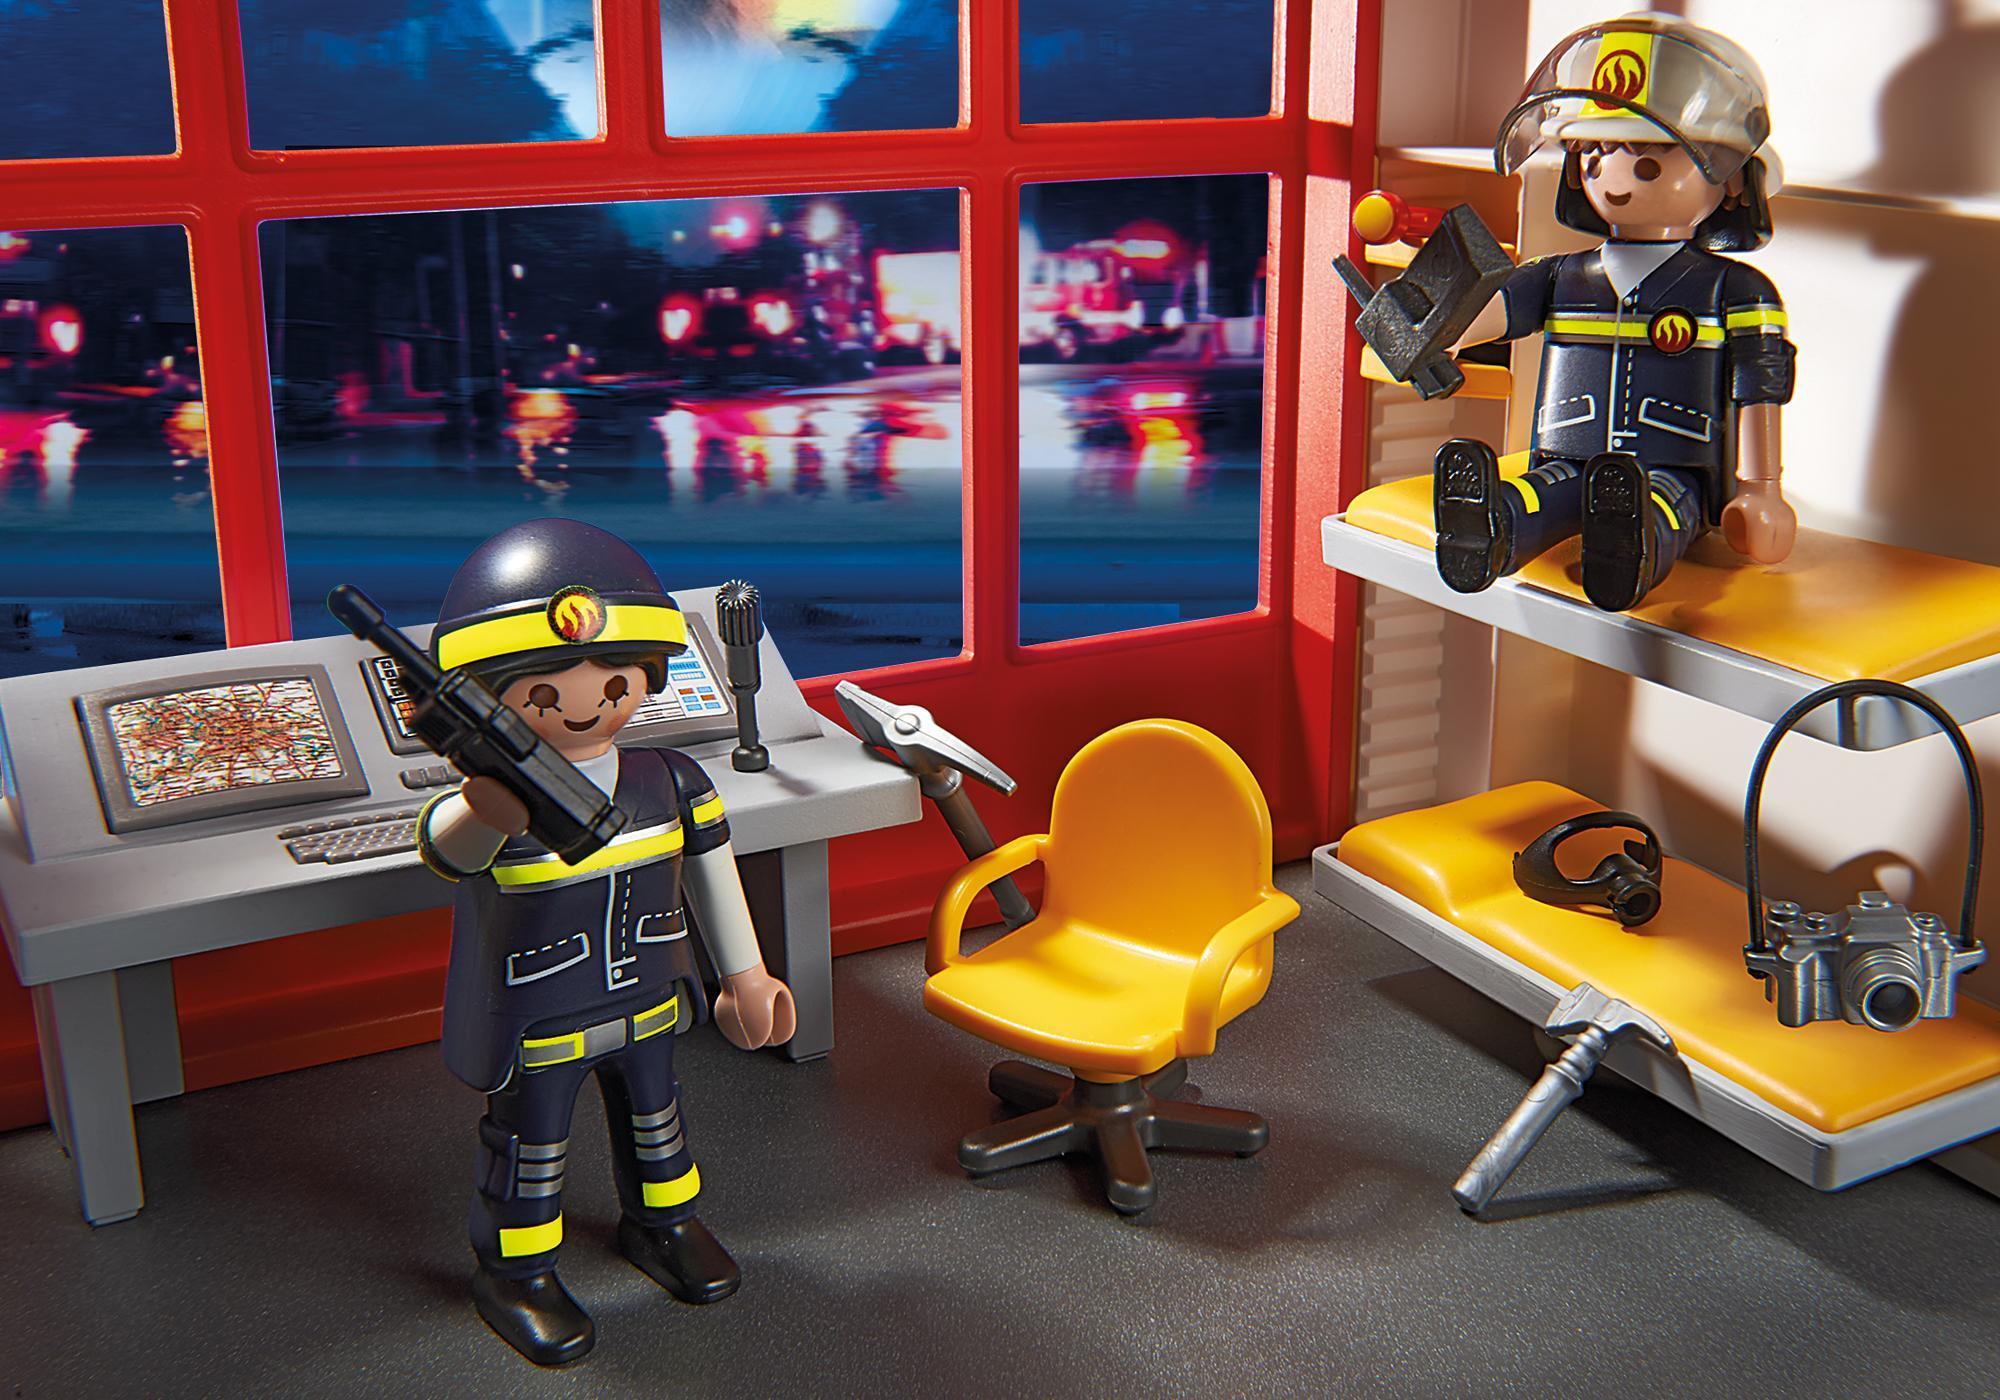 http://media.playmobil.com/i/playmobil/5361_product_extra2/Fire Station with Alarm